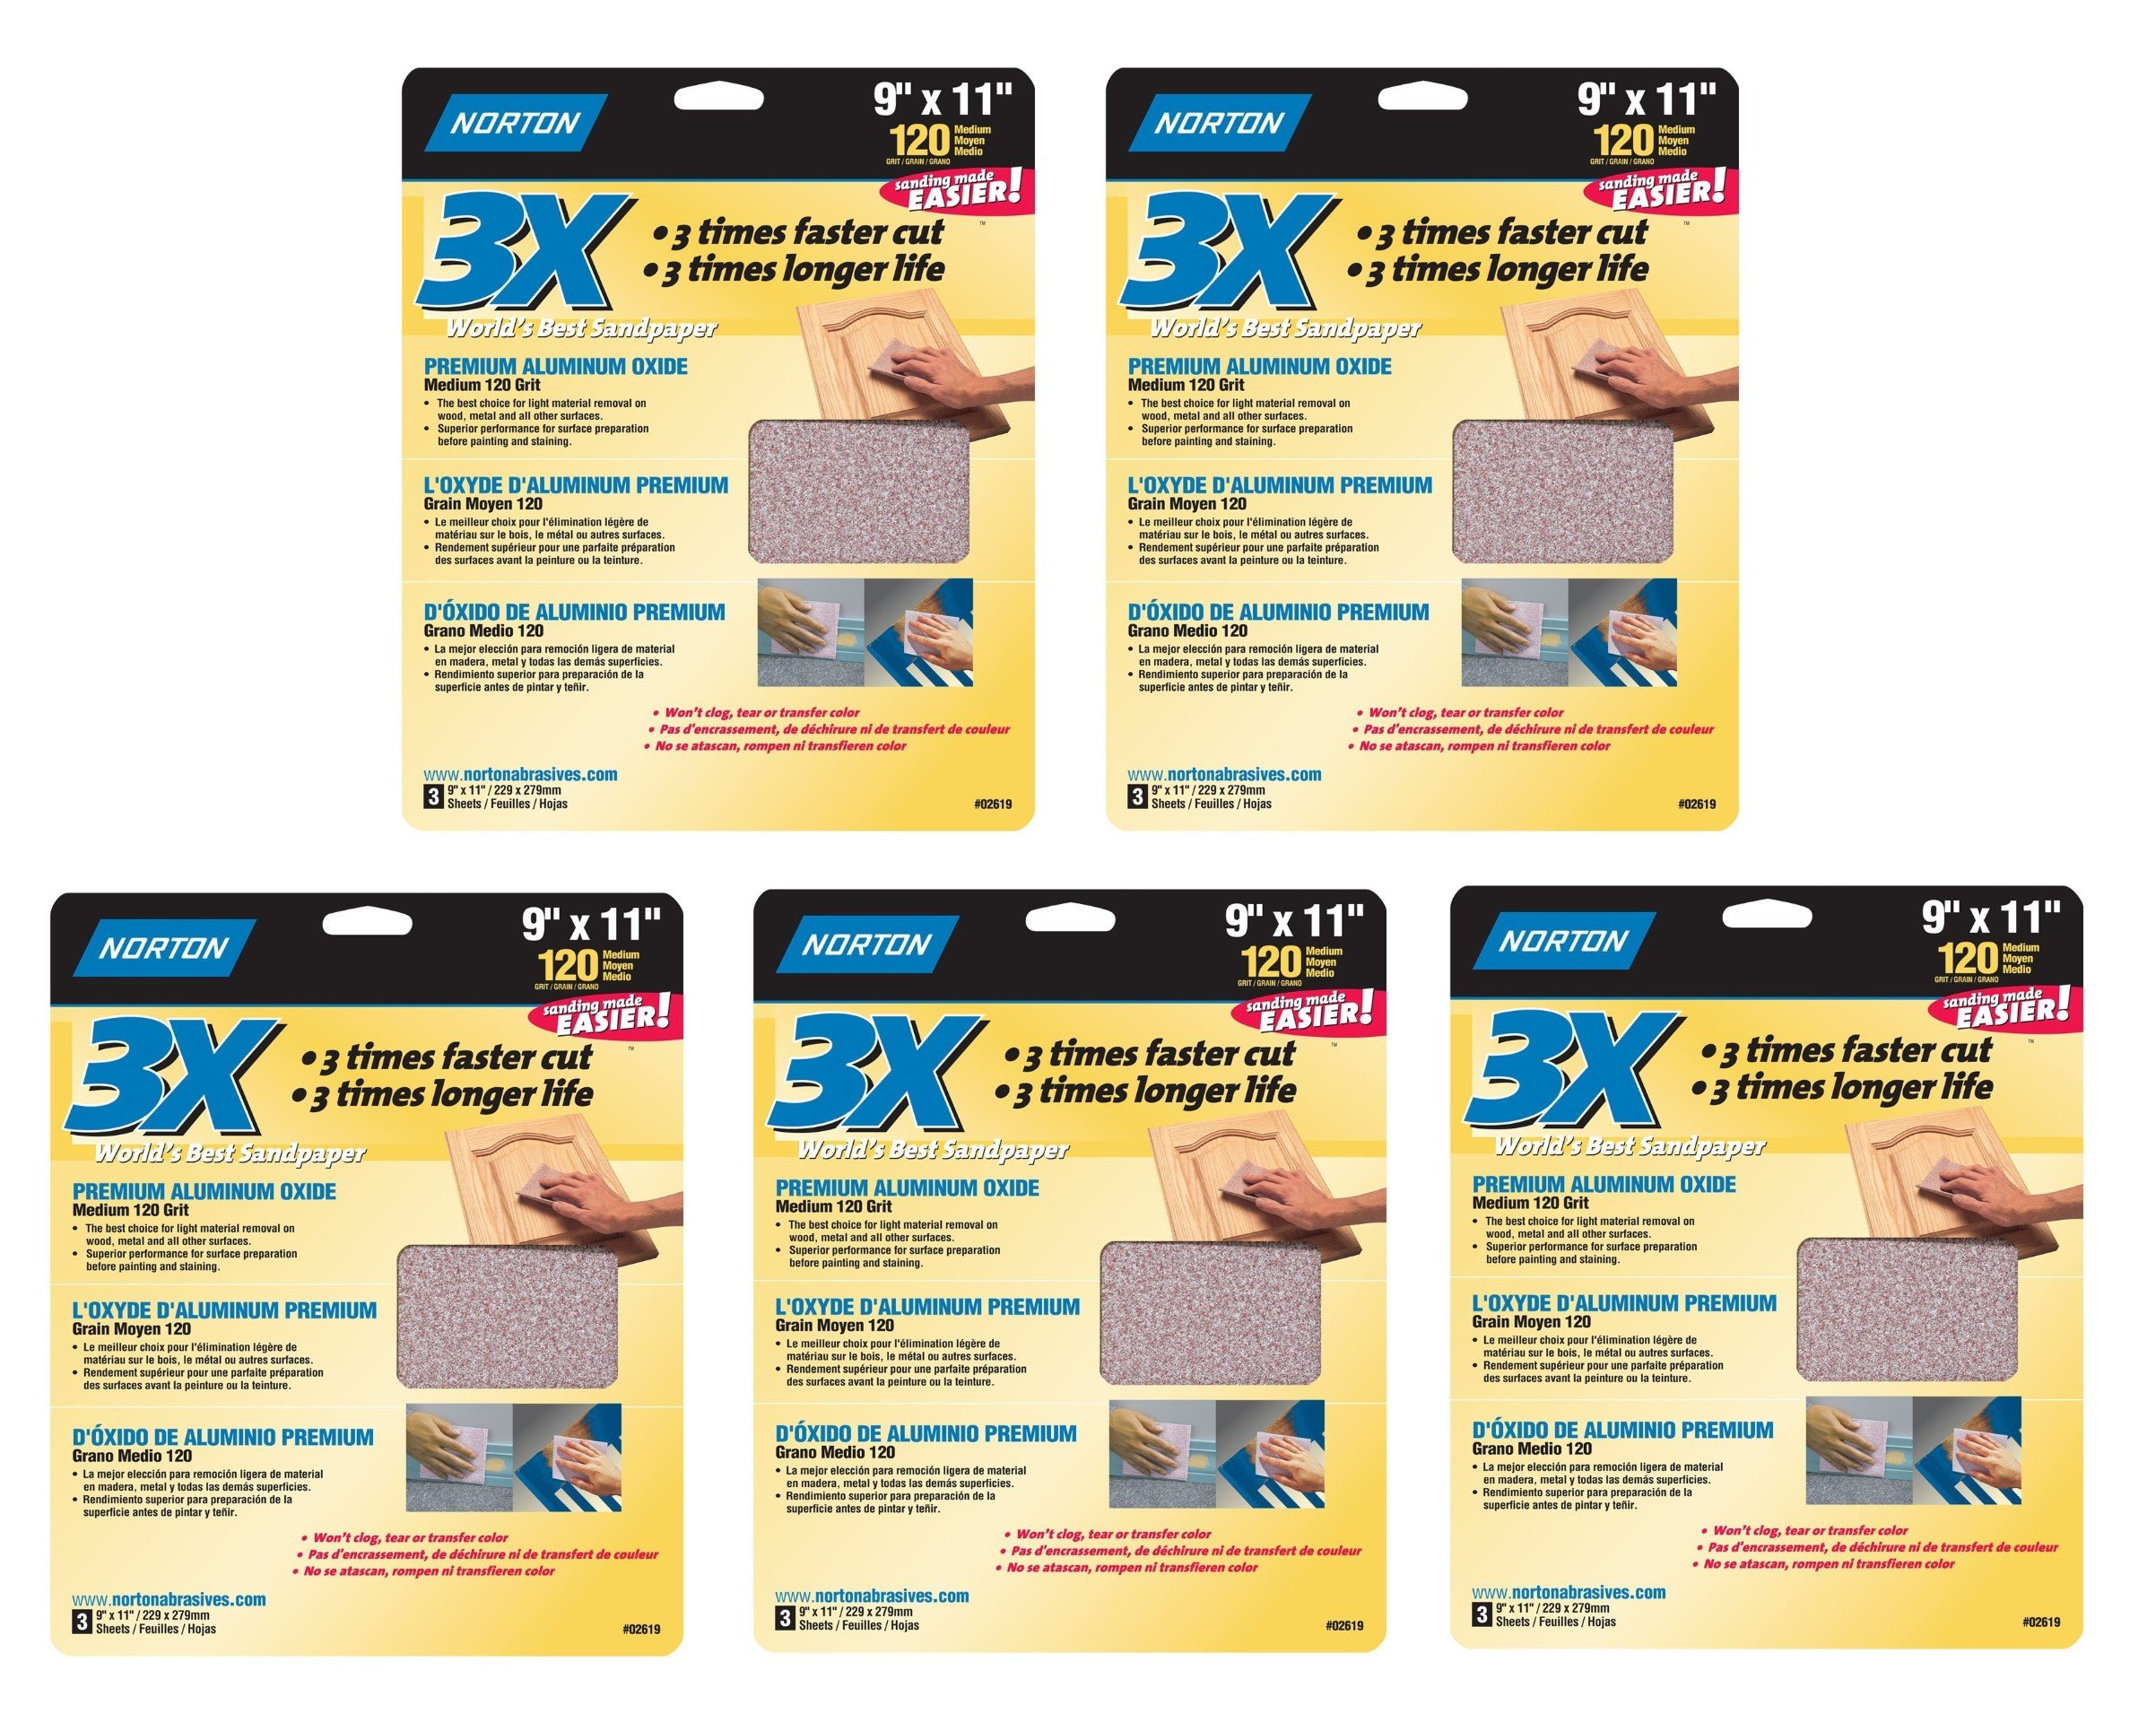 Norton 02619 3X Handy Aluminum-Oxide Sandpaper 120 Grit, 9-Inch x 11-Inch, 15 Sheets Total (5 Pack)